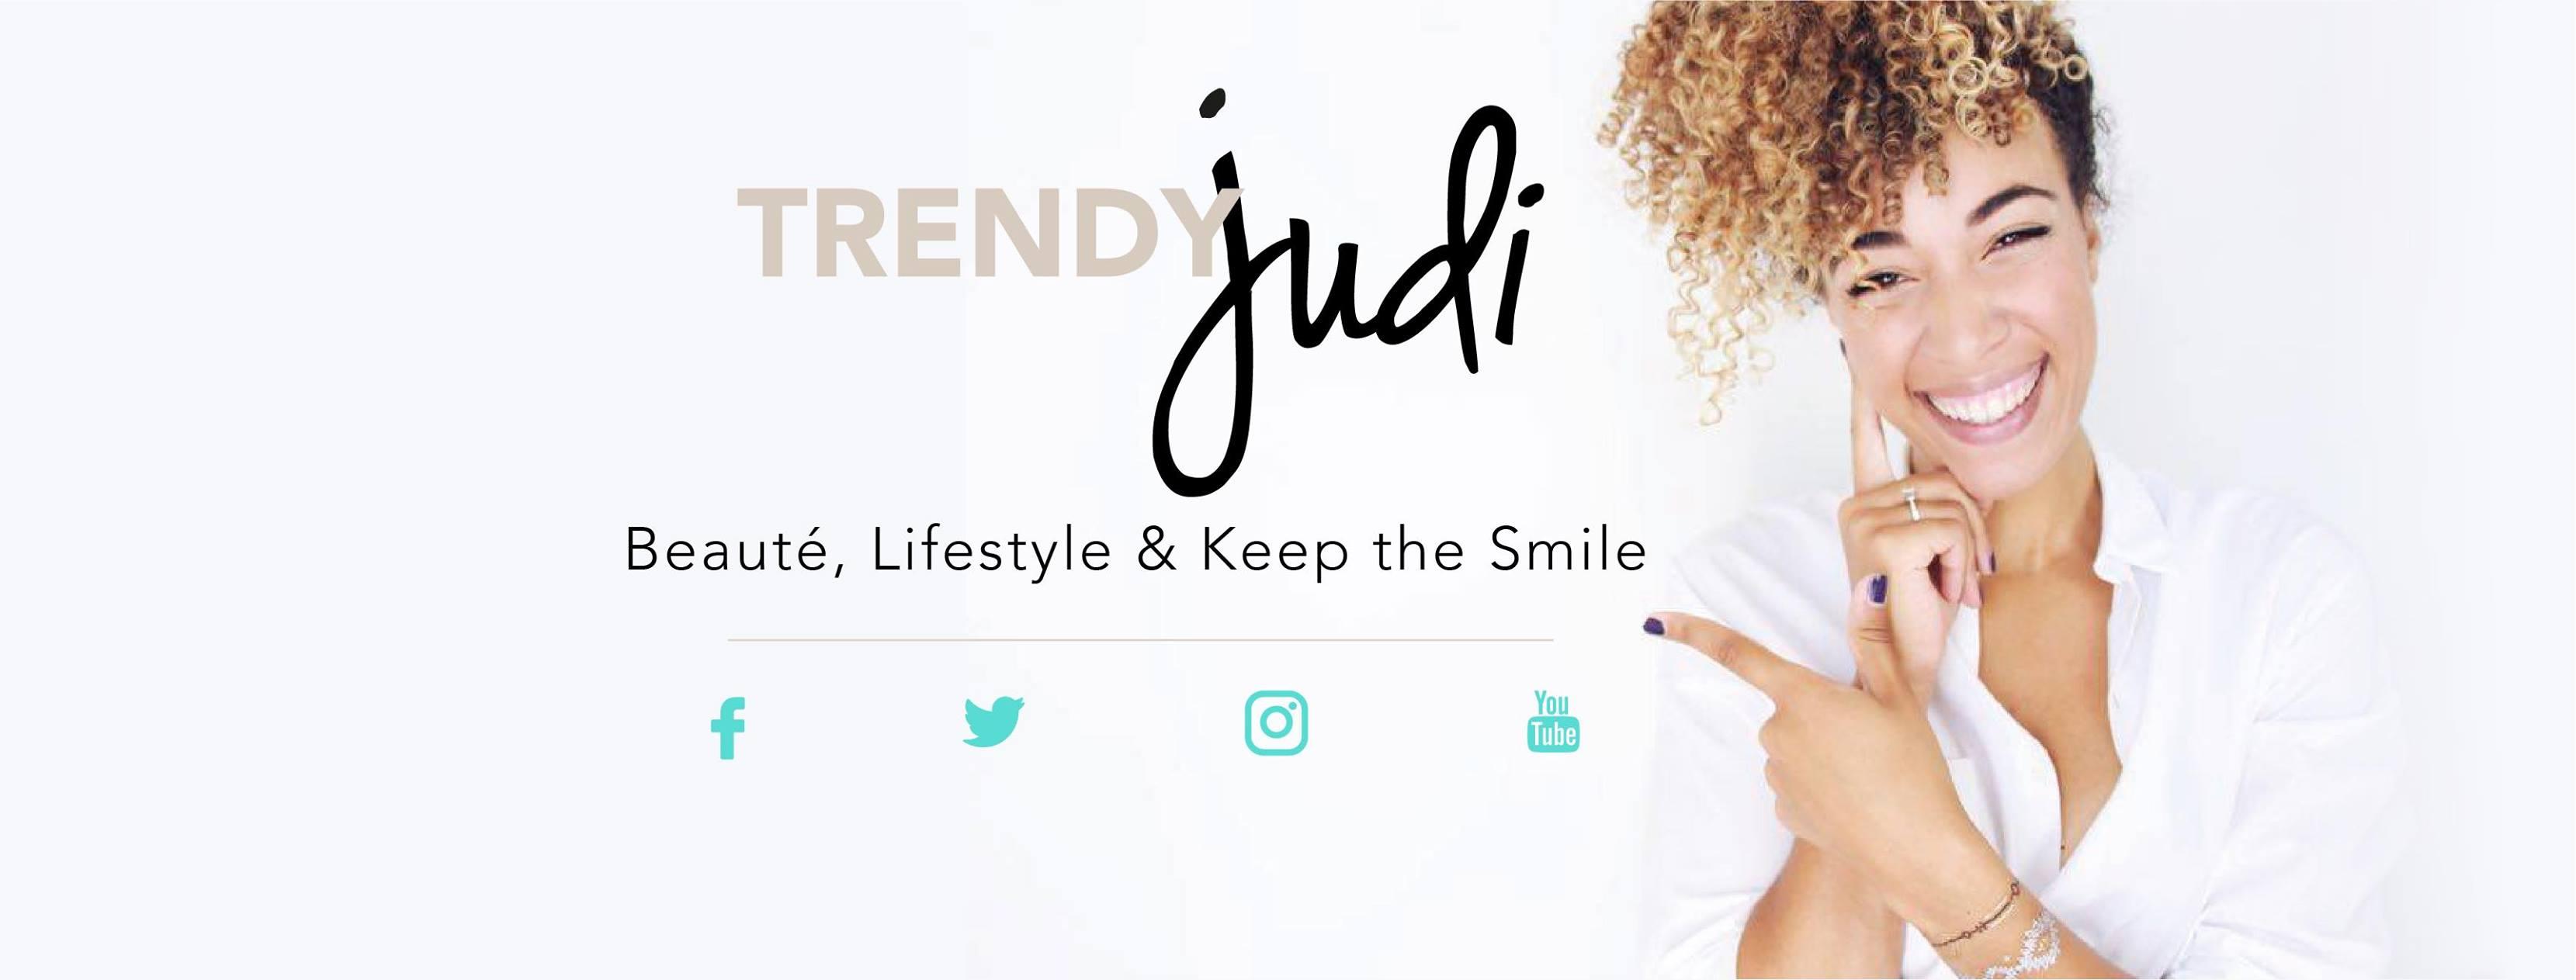 Judy trendy